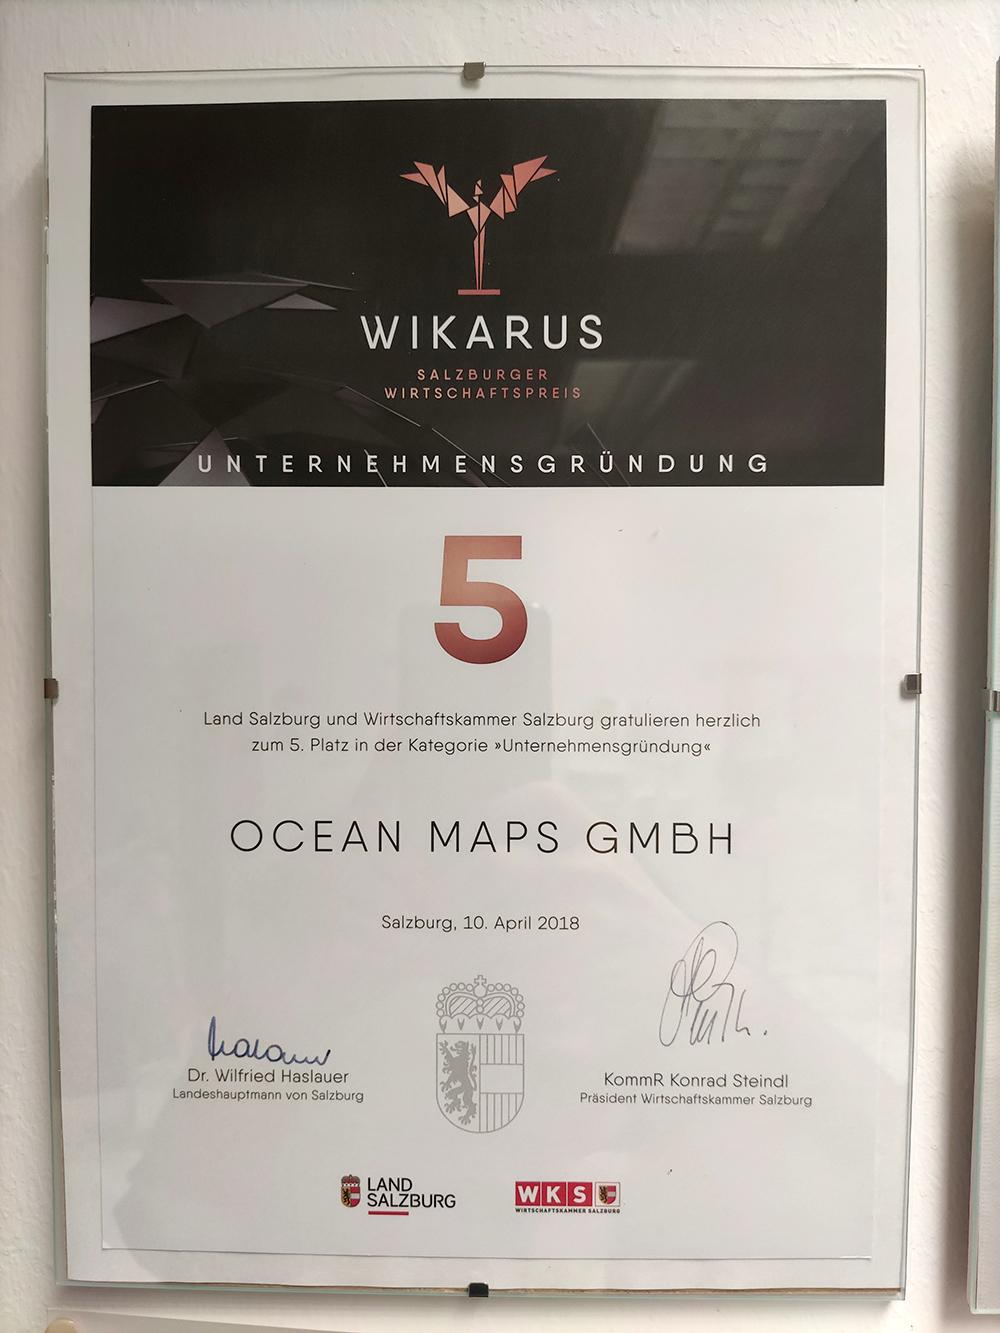 Wikarus Ocean-Maps-GmbH 2018